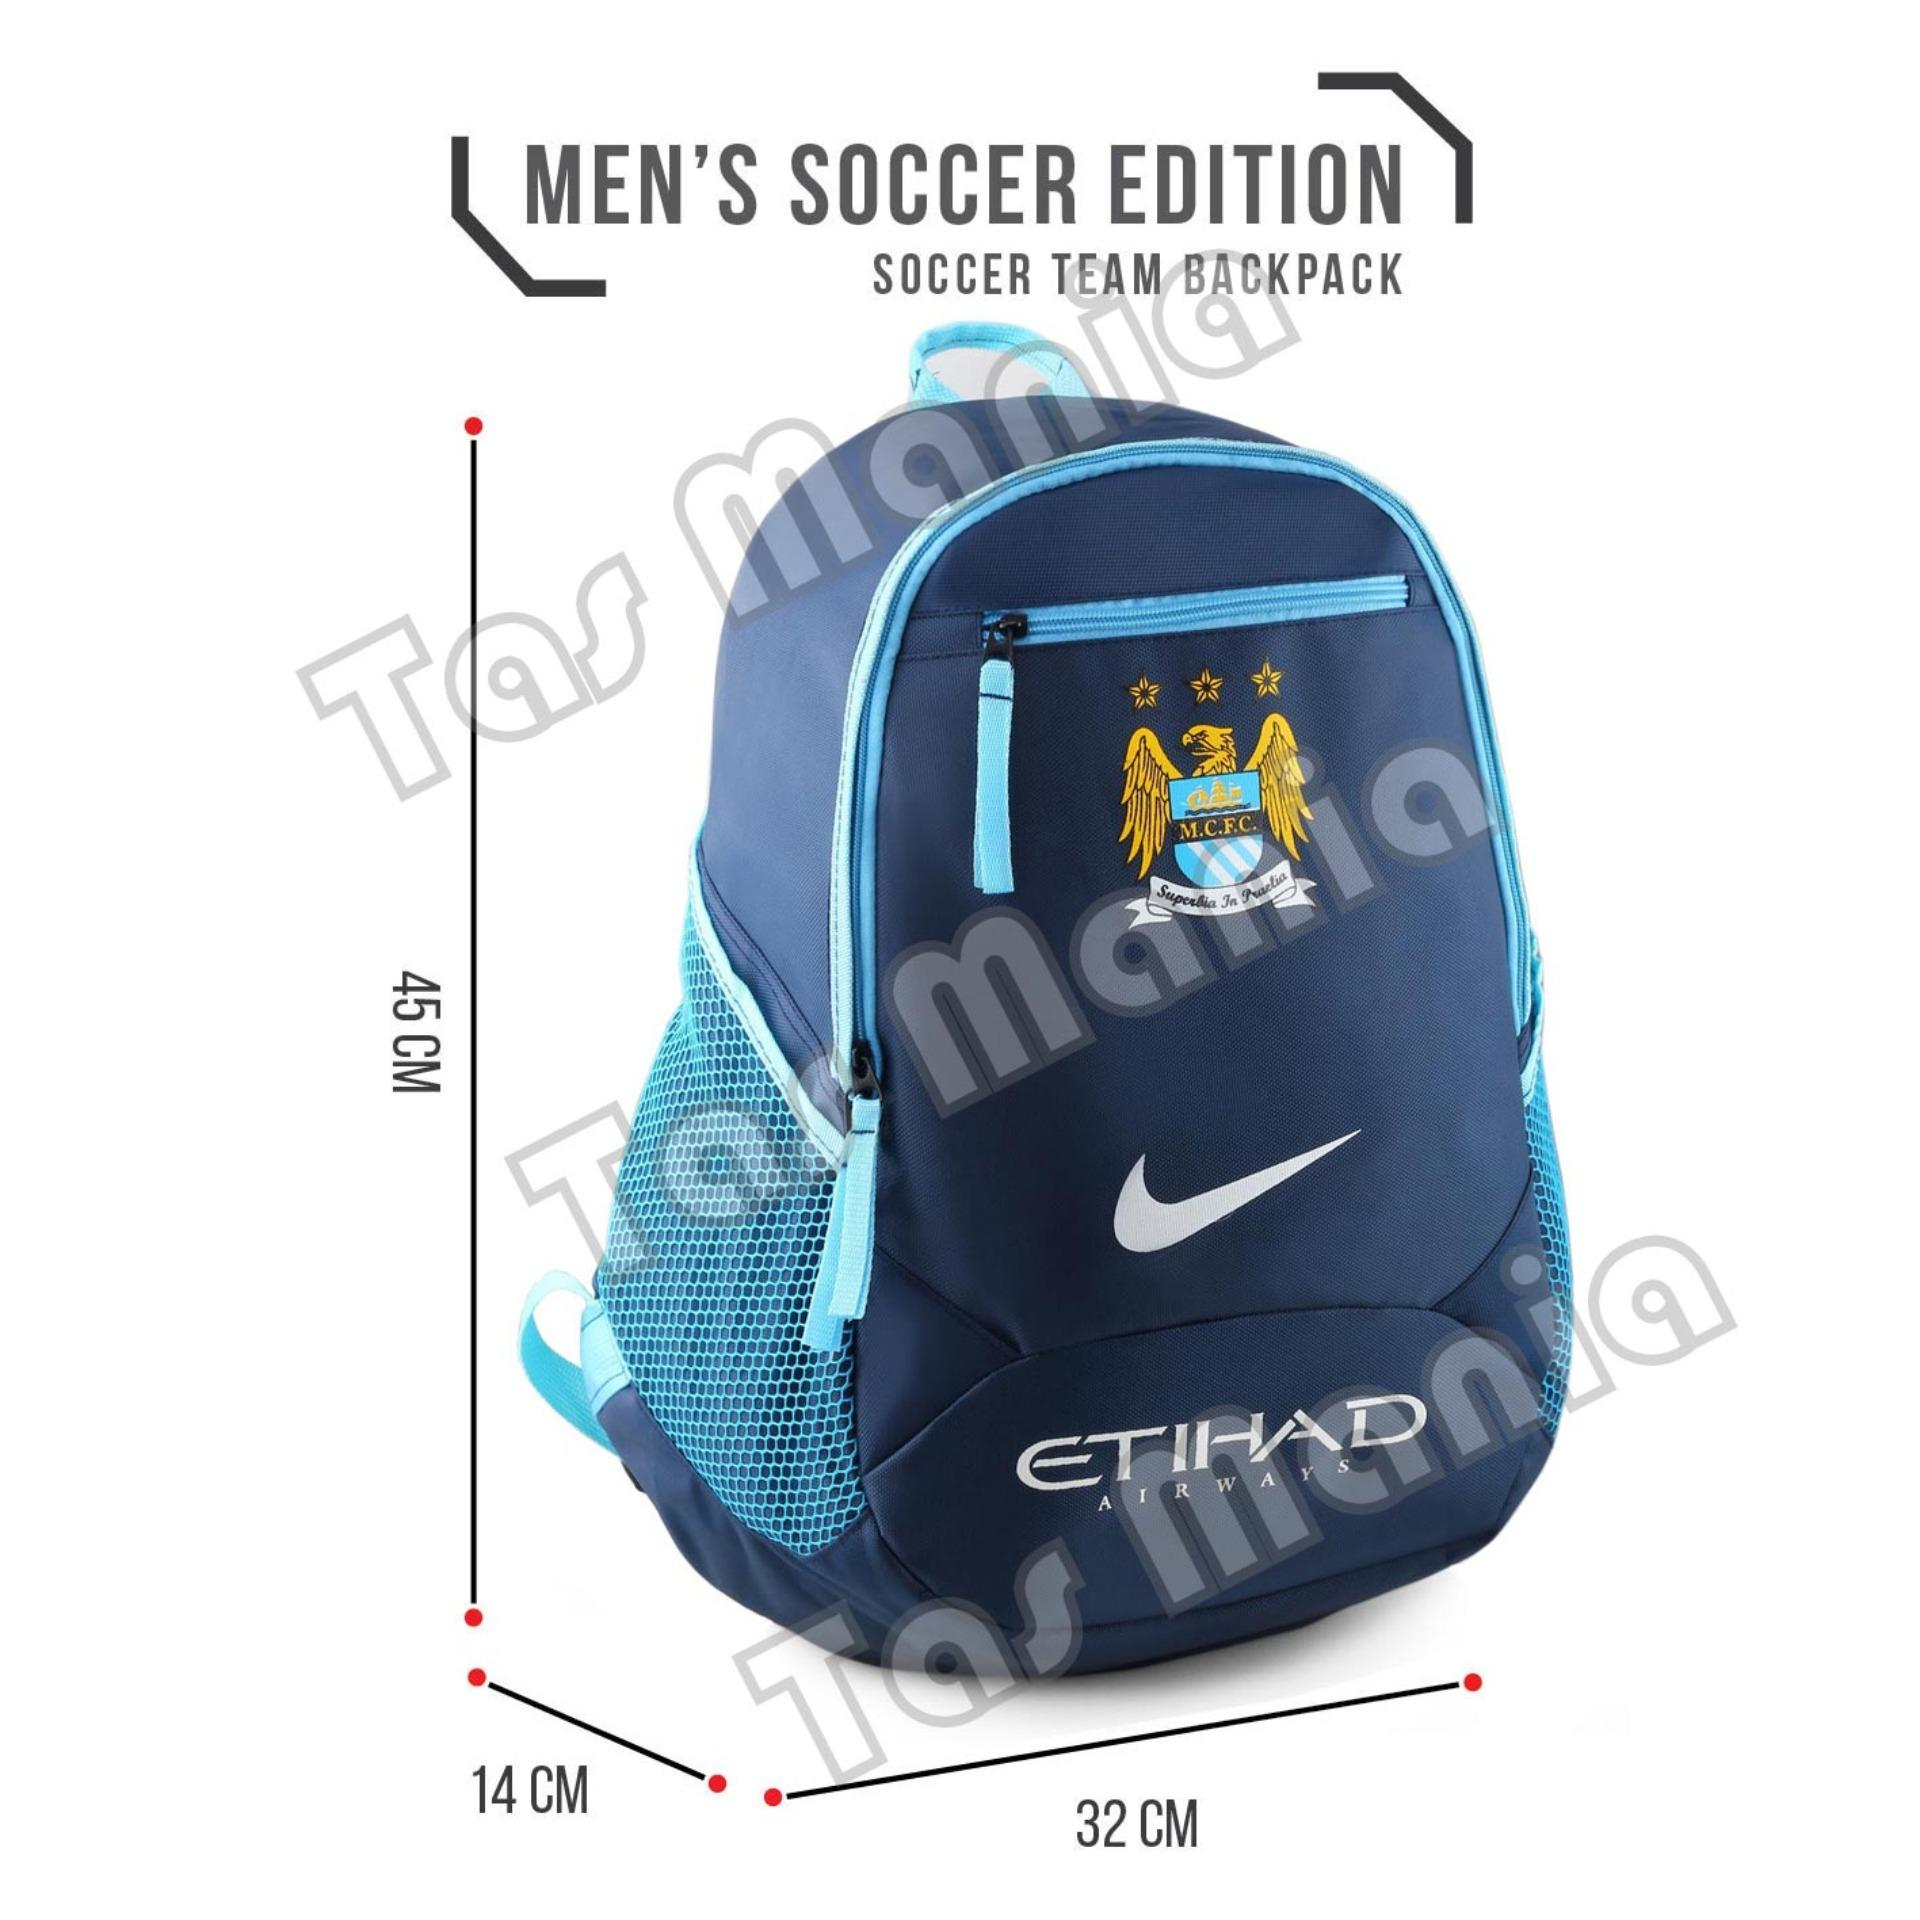 Tas Ransel Nike Bola Pria The Citizens - Etihad Laptop Backpack Mens Soccer .